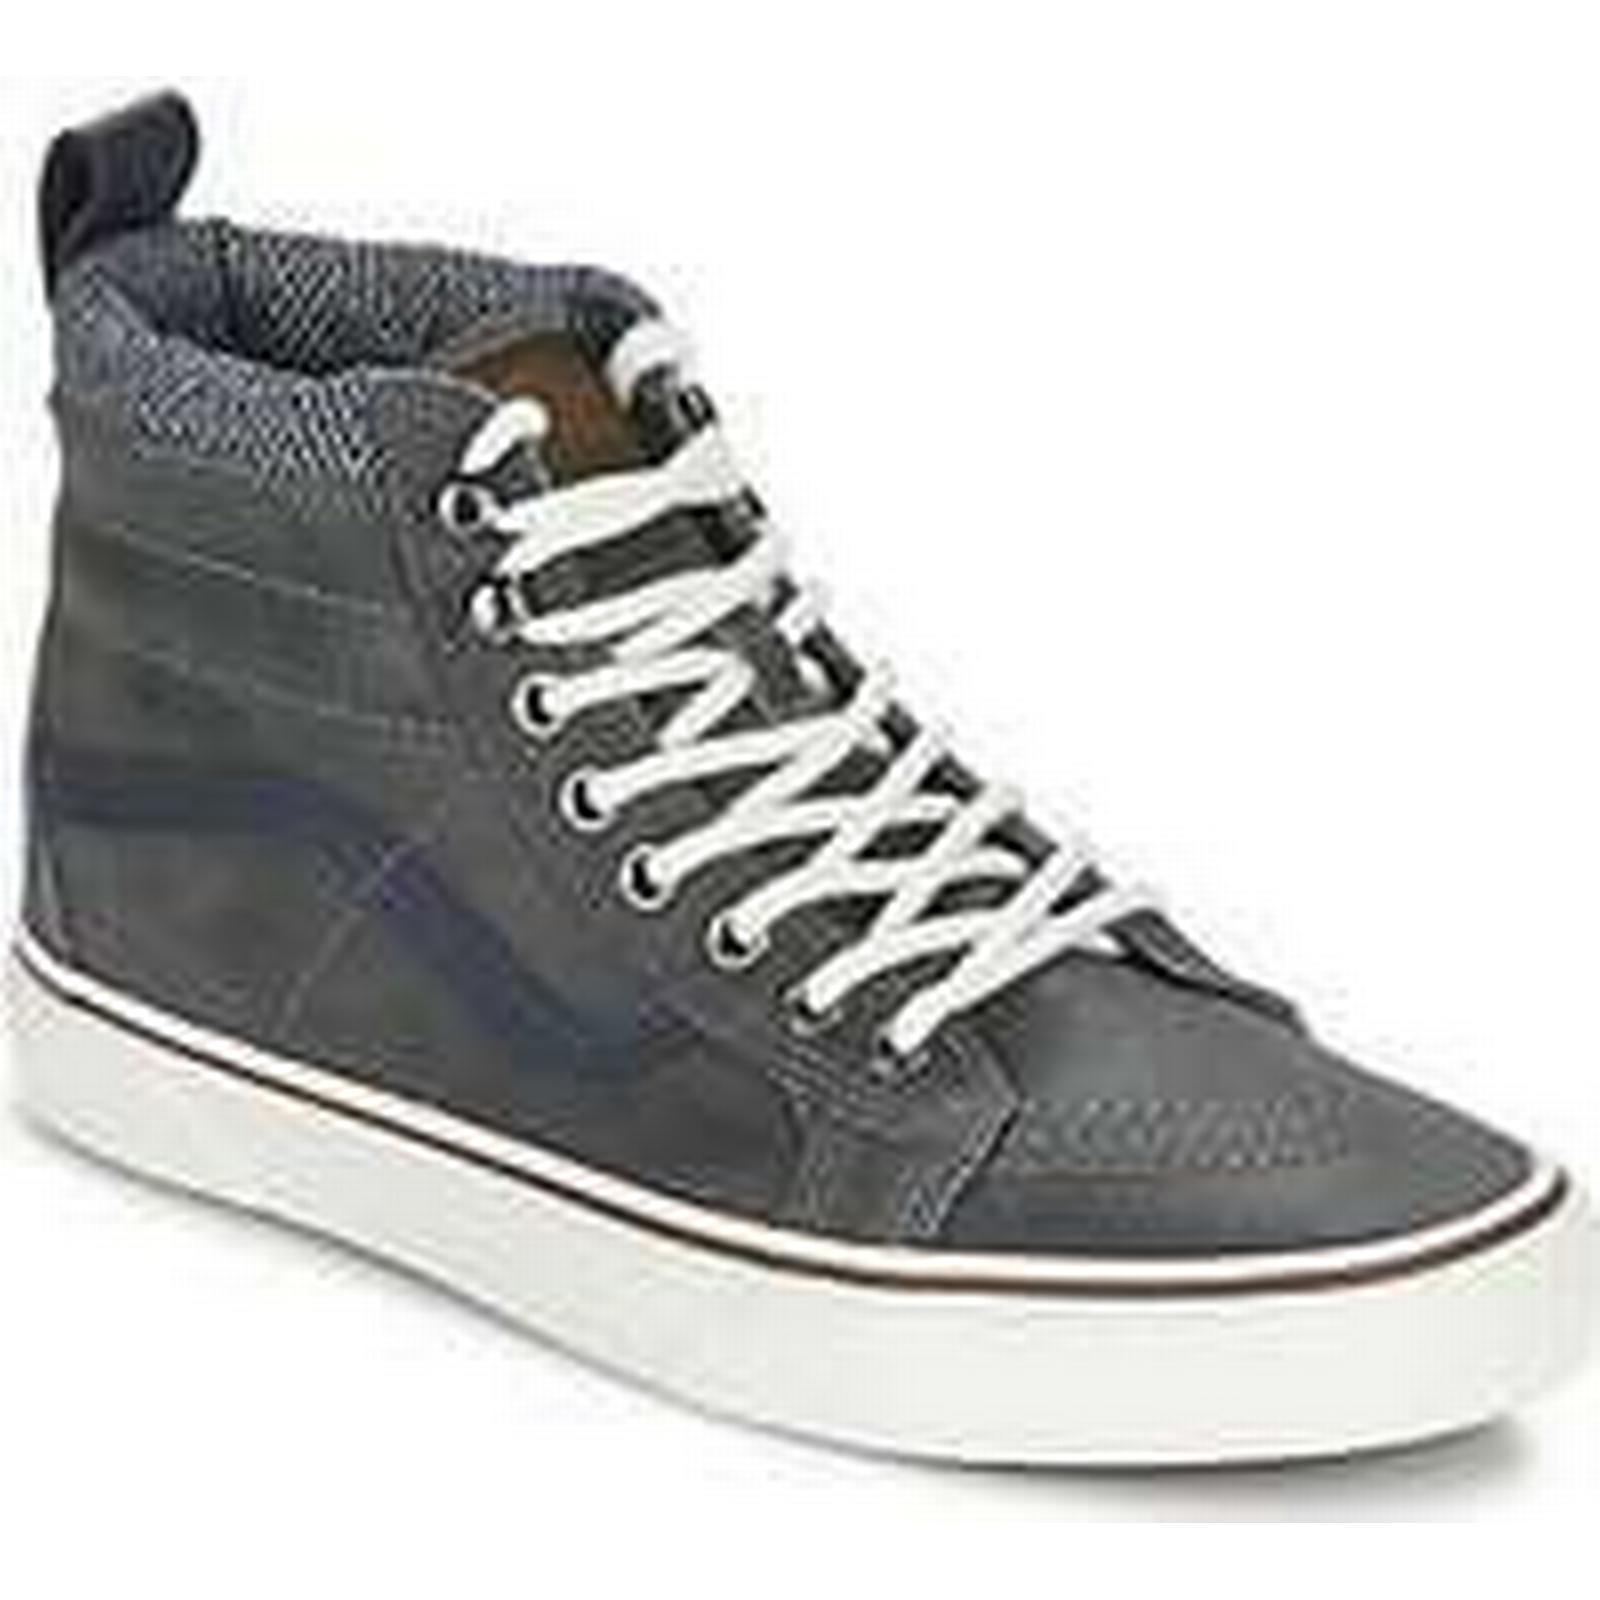 Spartoo.co.uk Vans SK8-Hi MTE in men's Shoes (High-top Trainers) in MTE Grey b4b1da